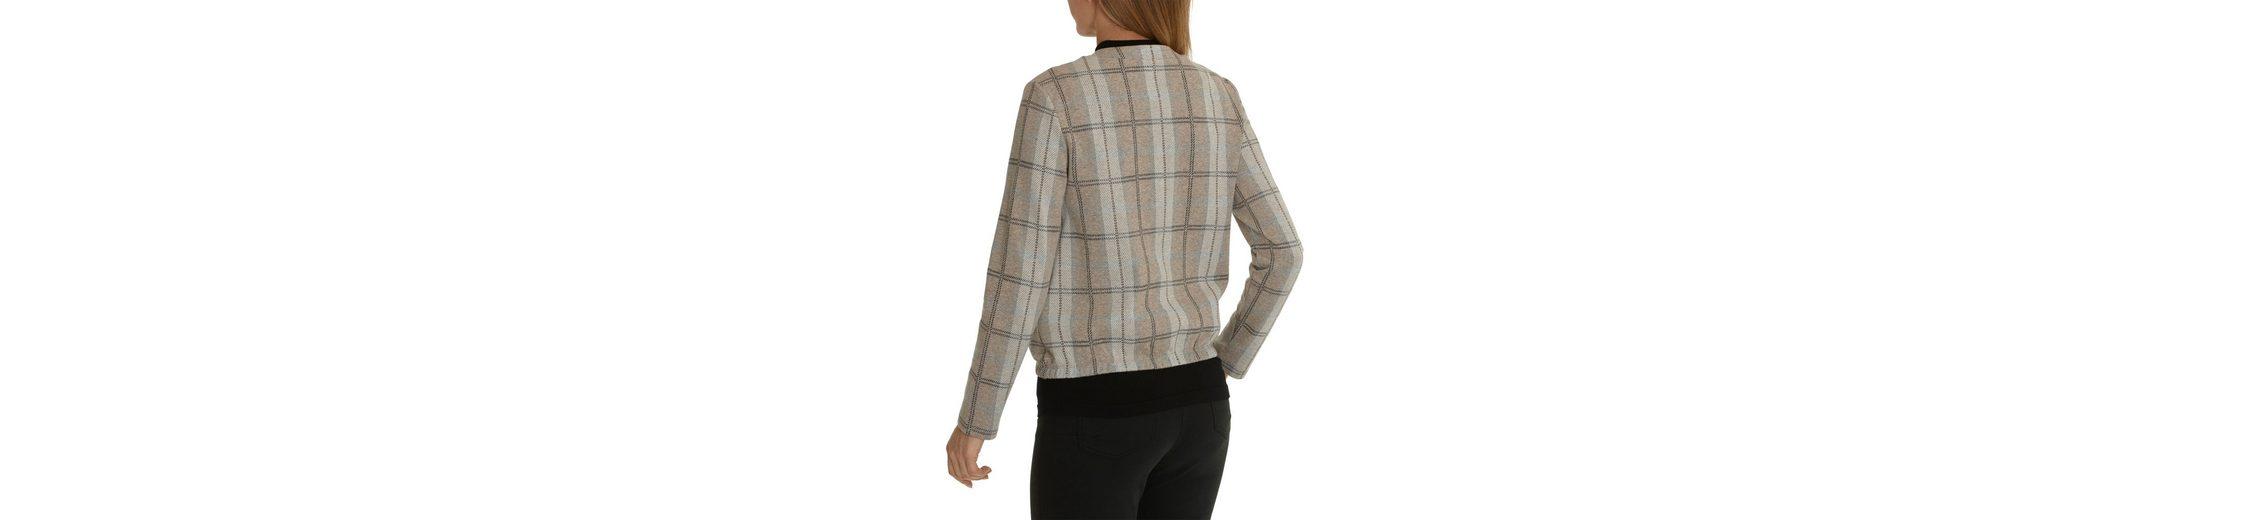 Betty Barclay Shirtjacke mit Karomuster Wirklich Günstig Online r5Mgvl8